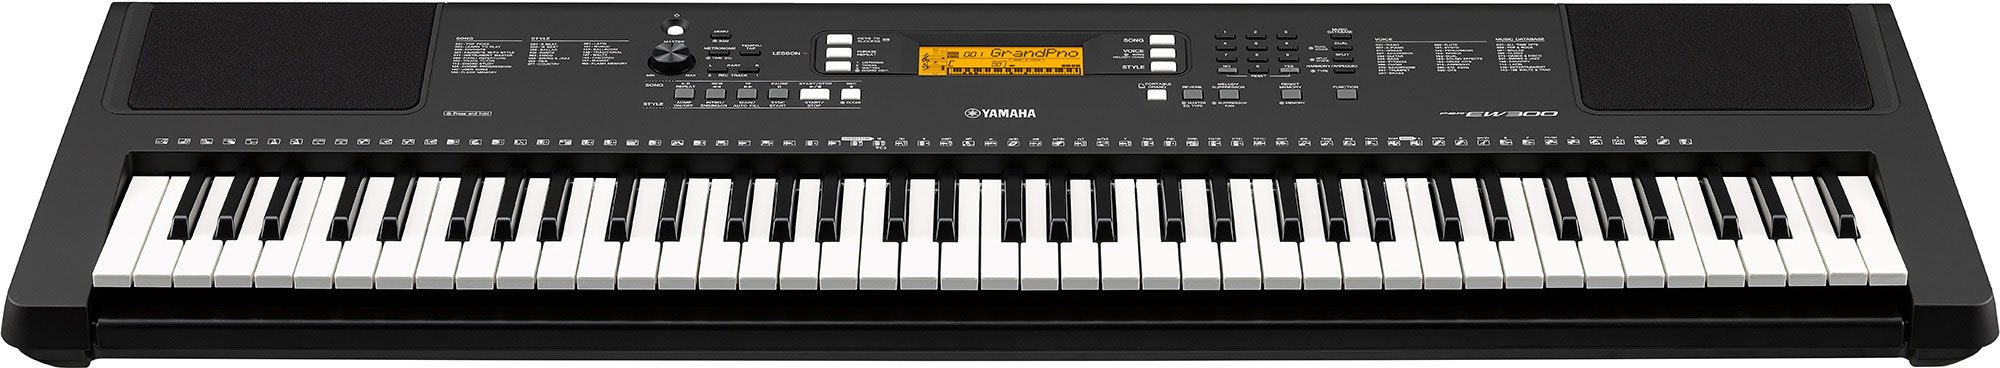 Yamaha PSR-EW300 digitalpiano